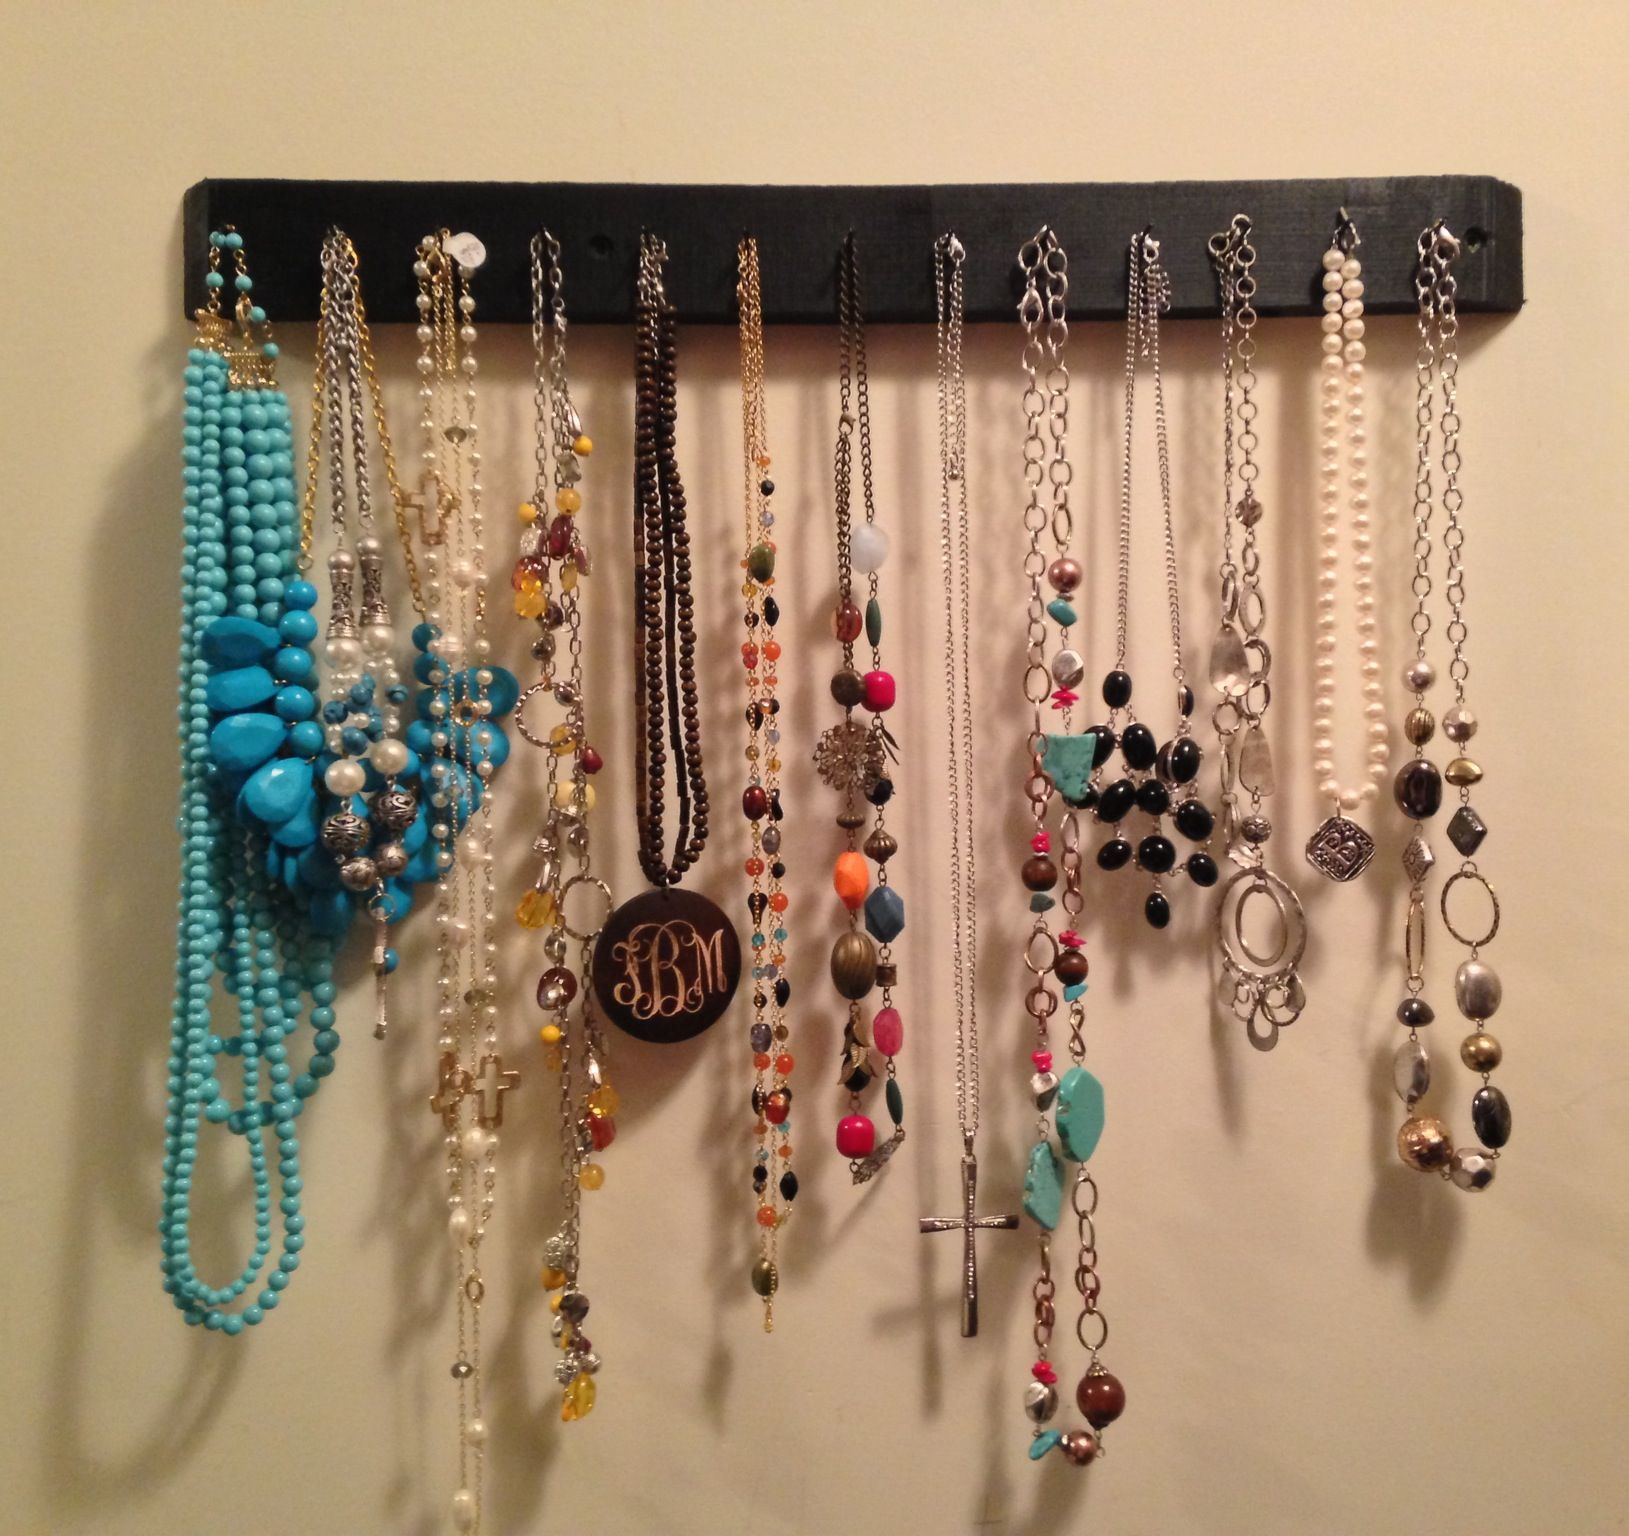 Jewelry Organizer Mark Made Me Love It